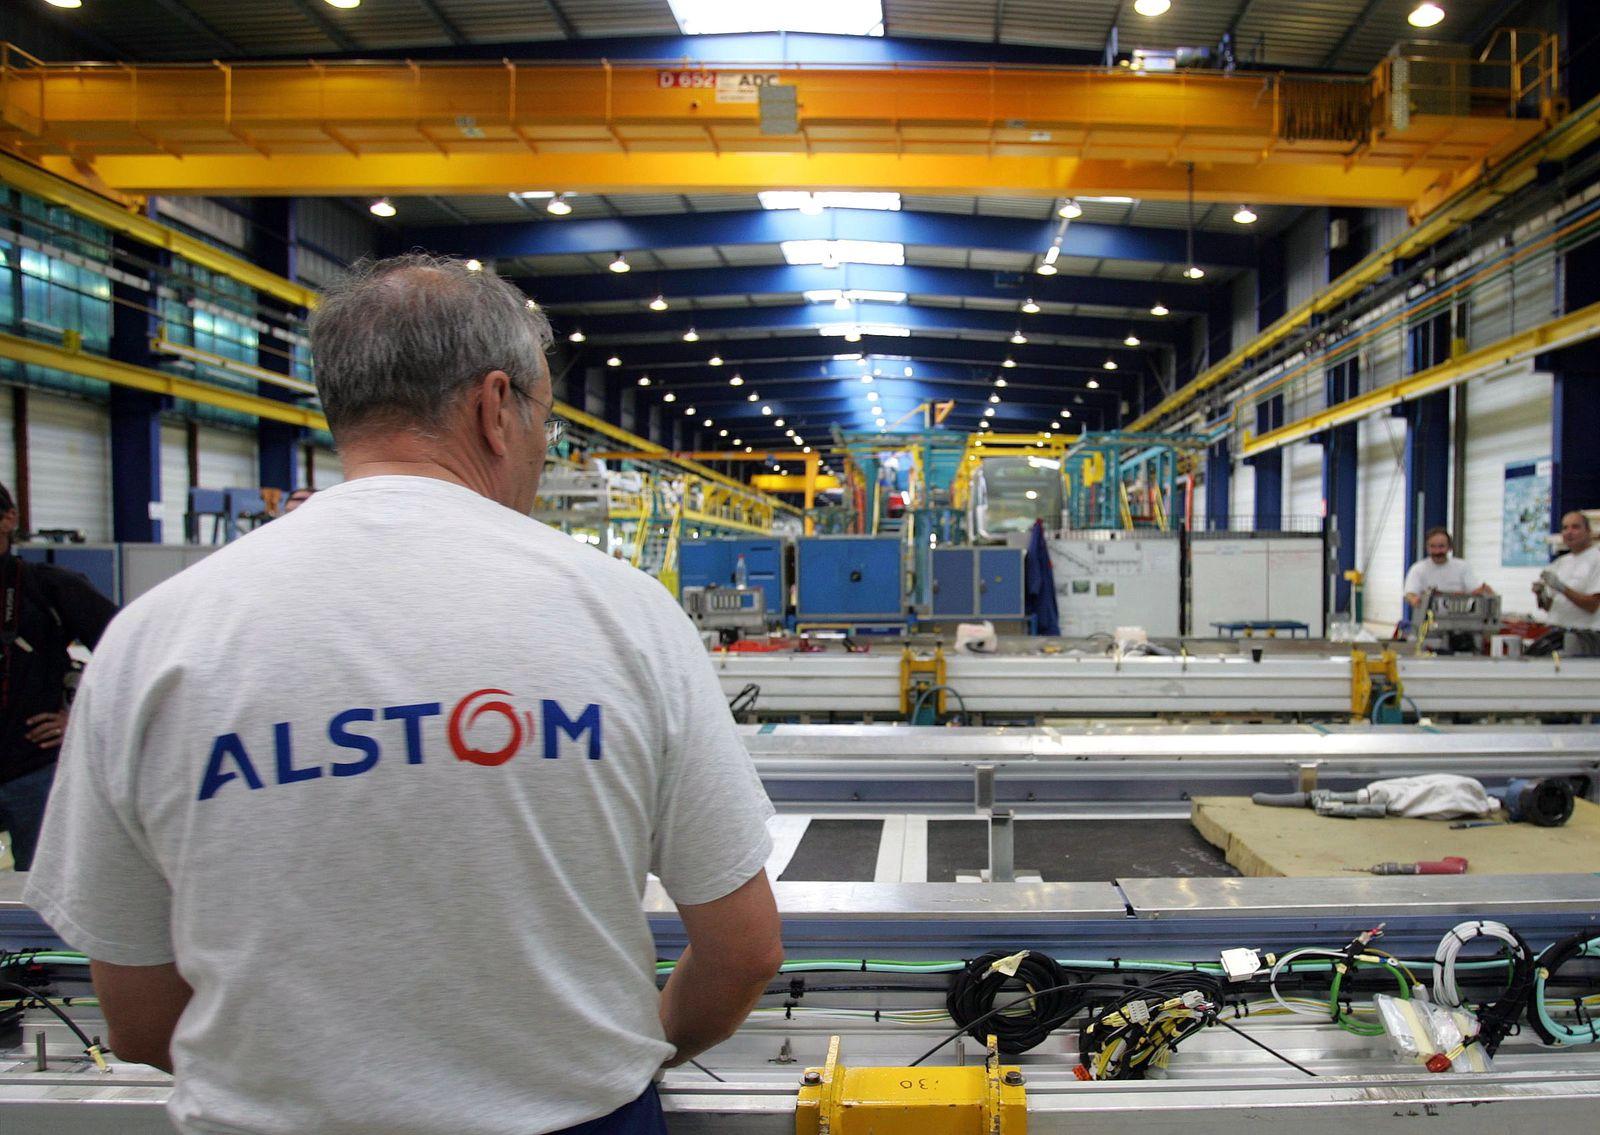 Frankreich / Alstom Fabrik / Bahntechnikunternehmen